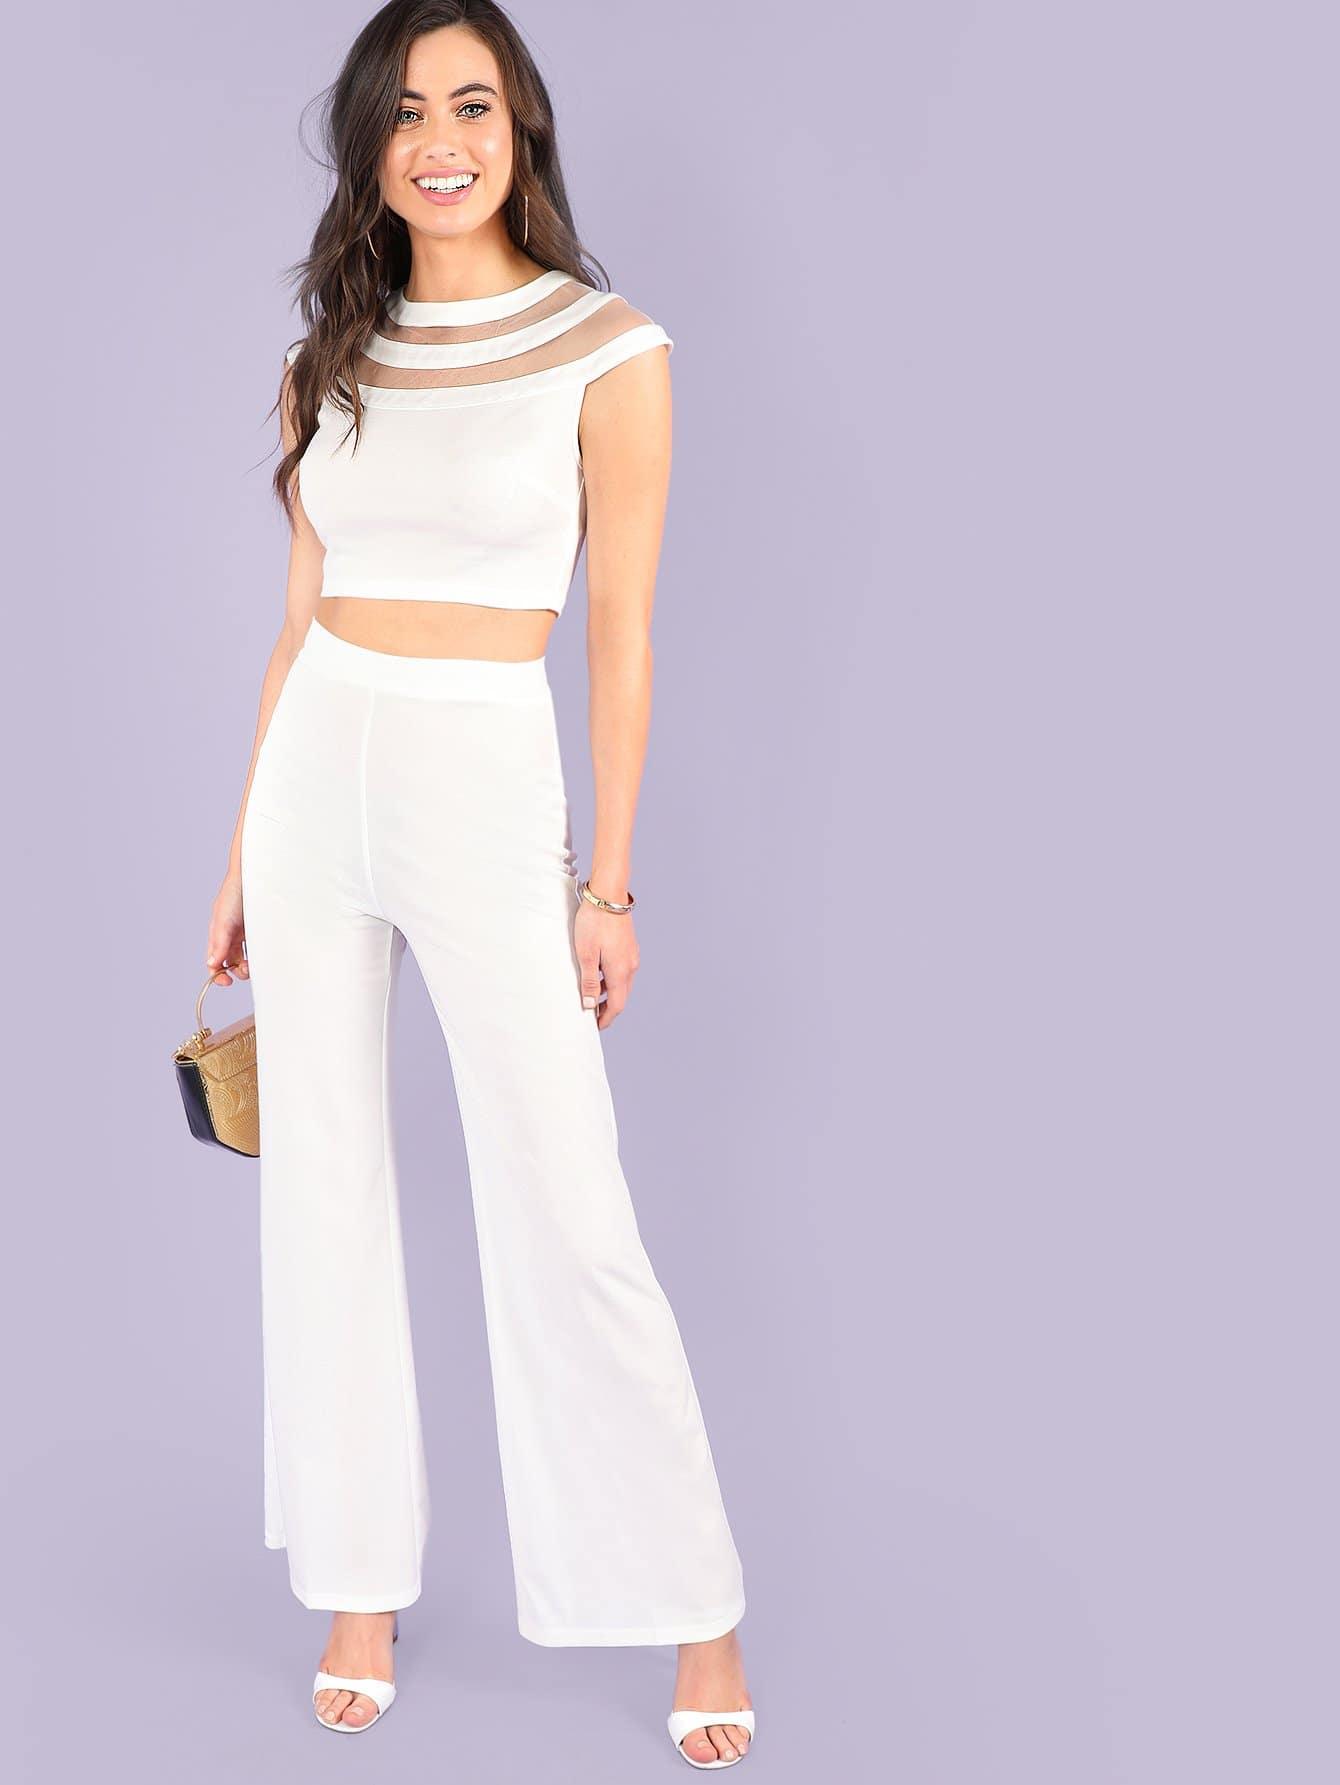 Contrast Mesh Crop Top & Wide Leg Pants Set black choker sleeveless crop top